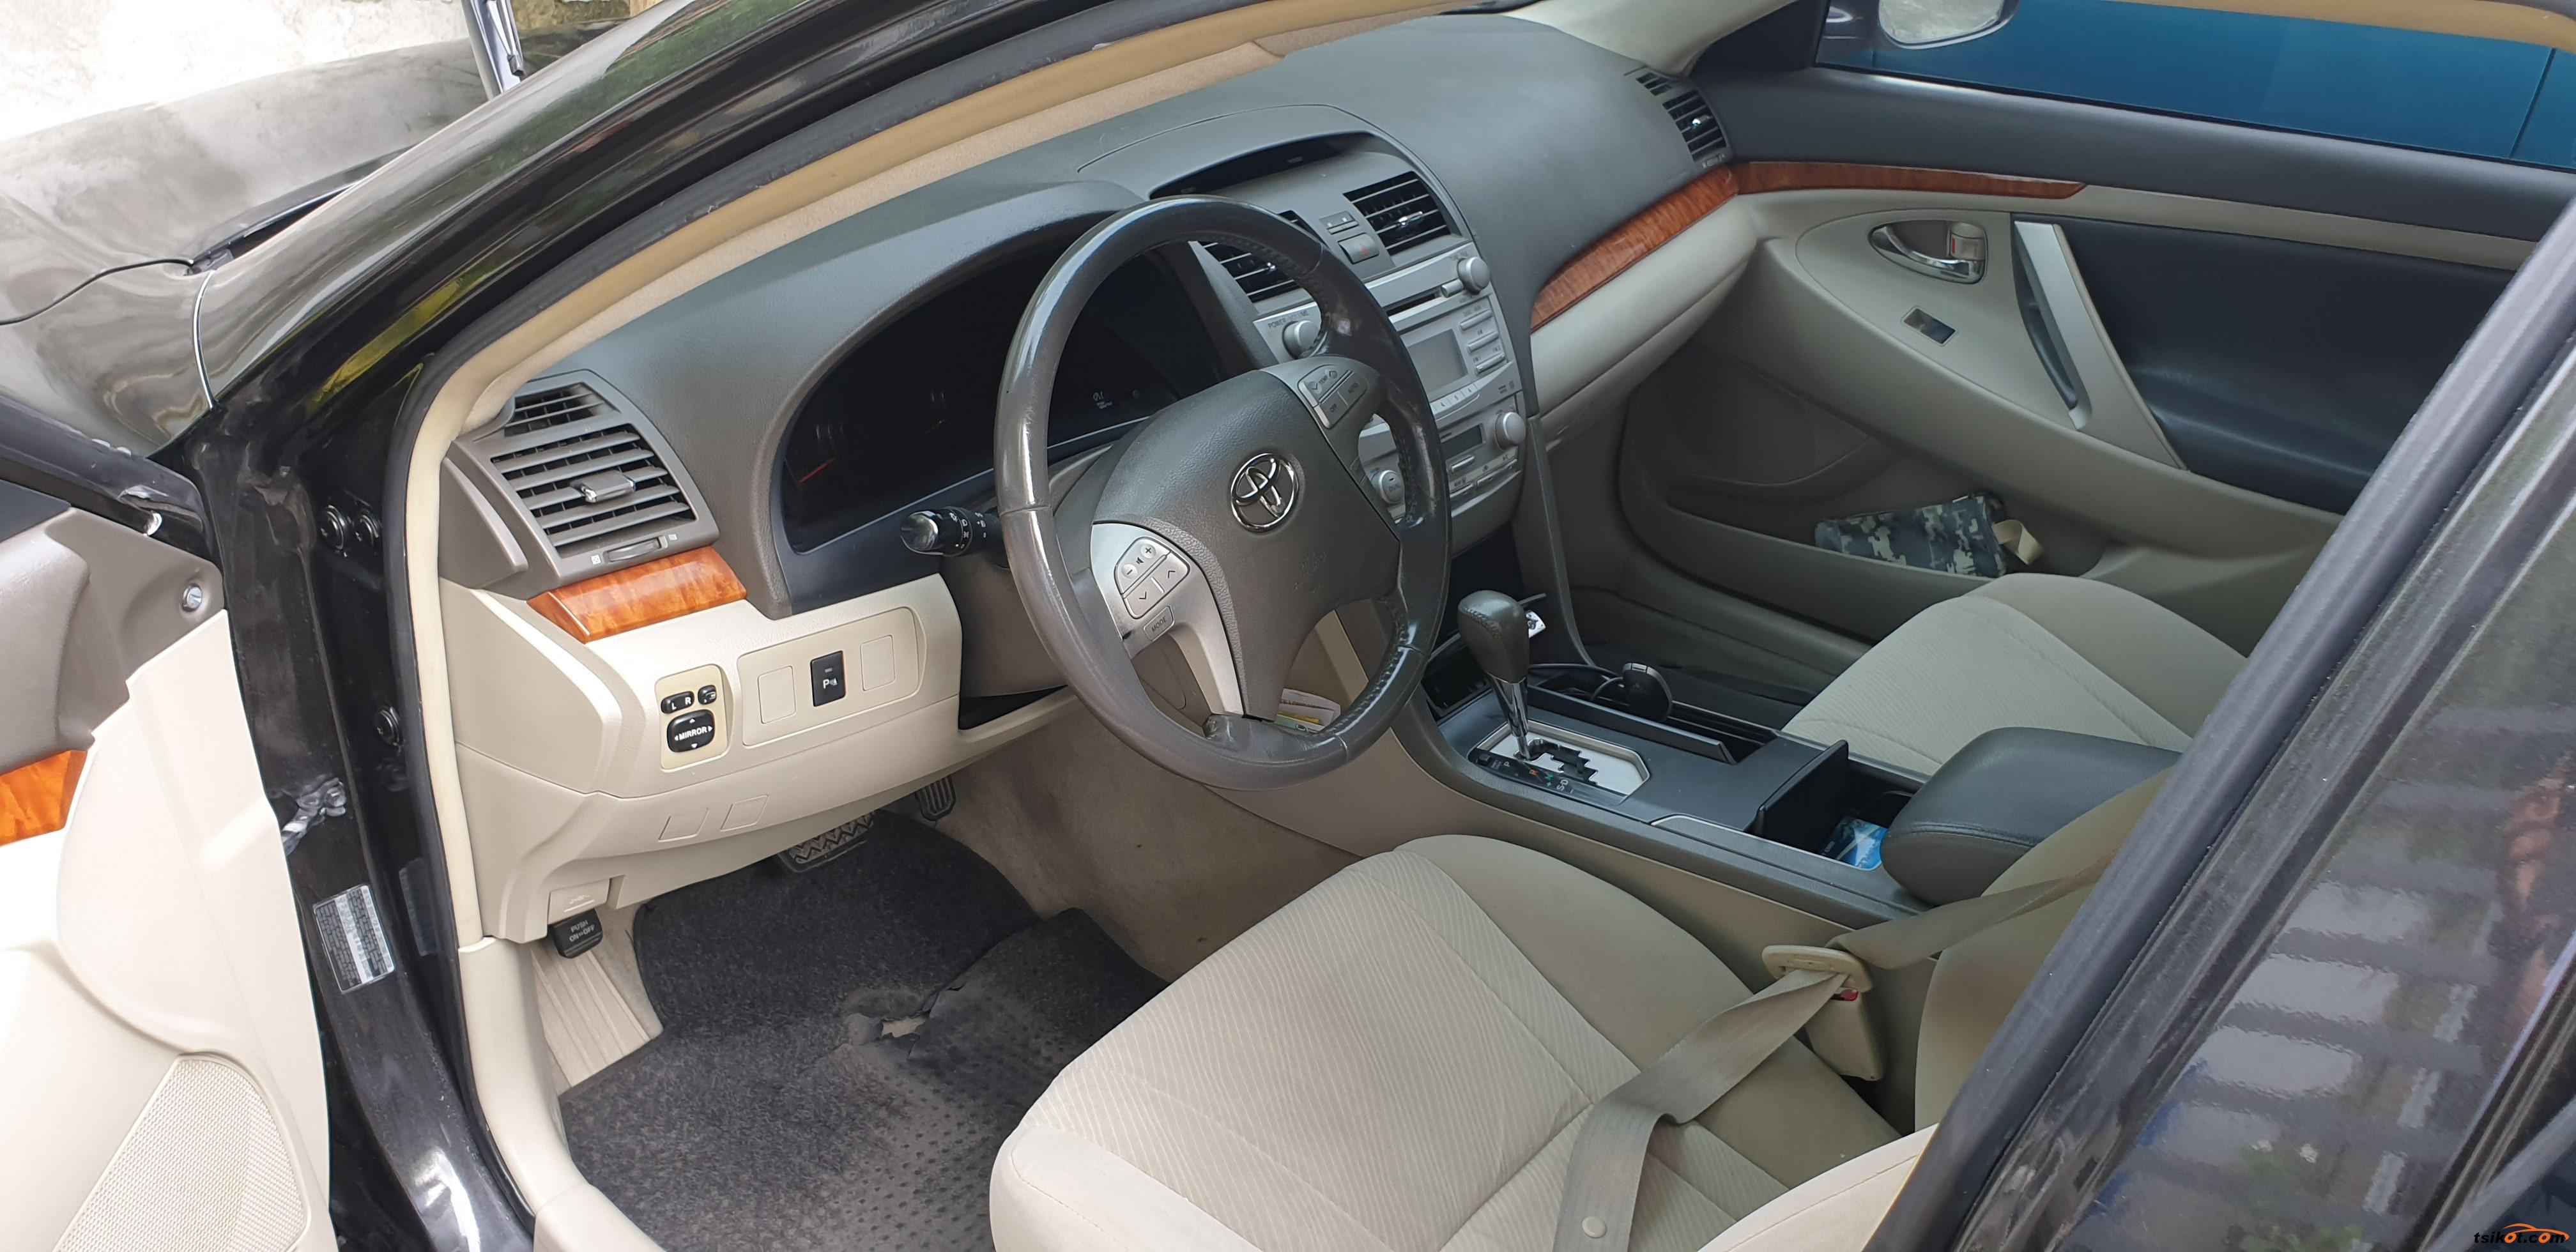 Toyota Camry 2010 - 2